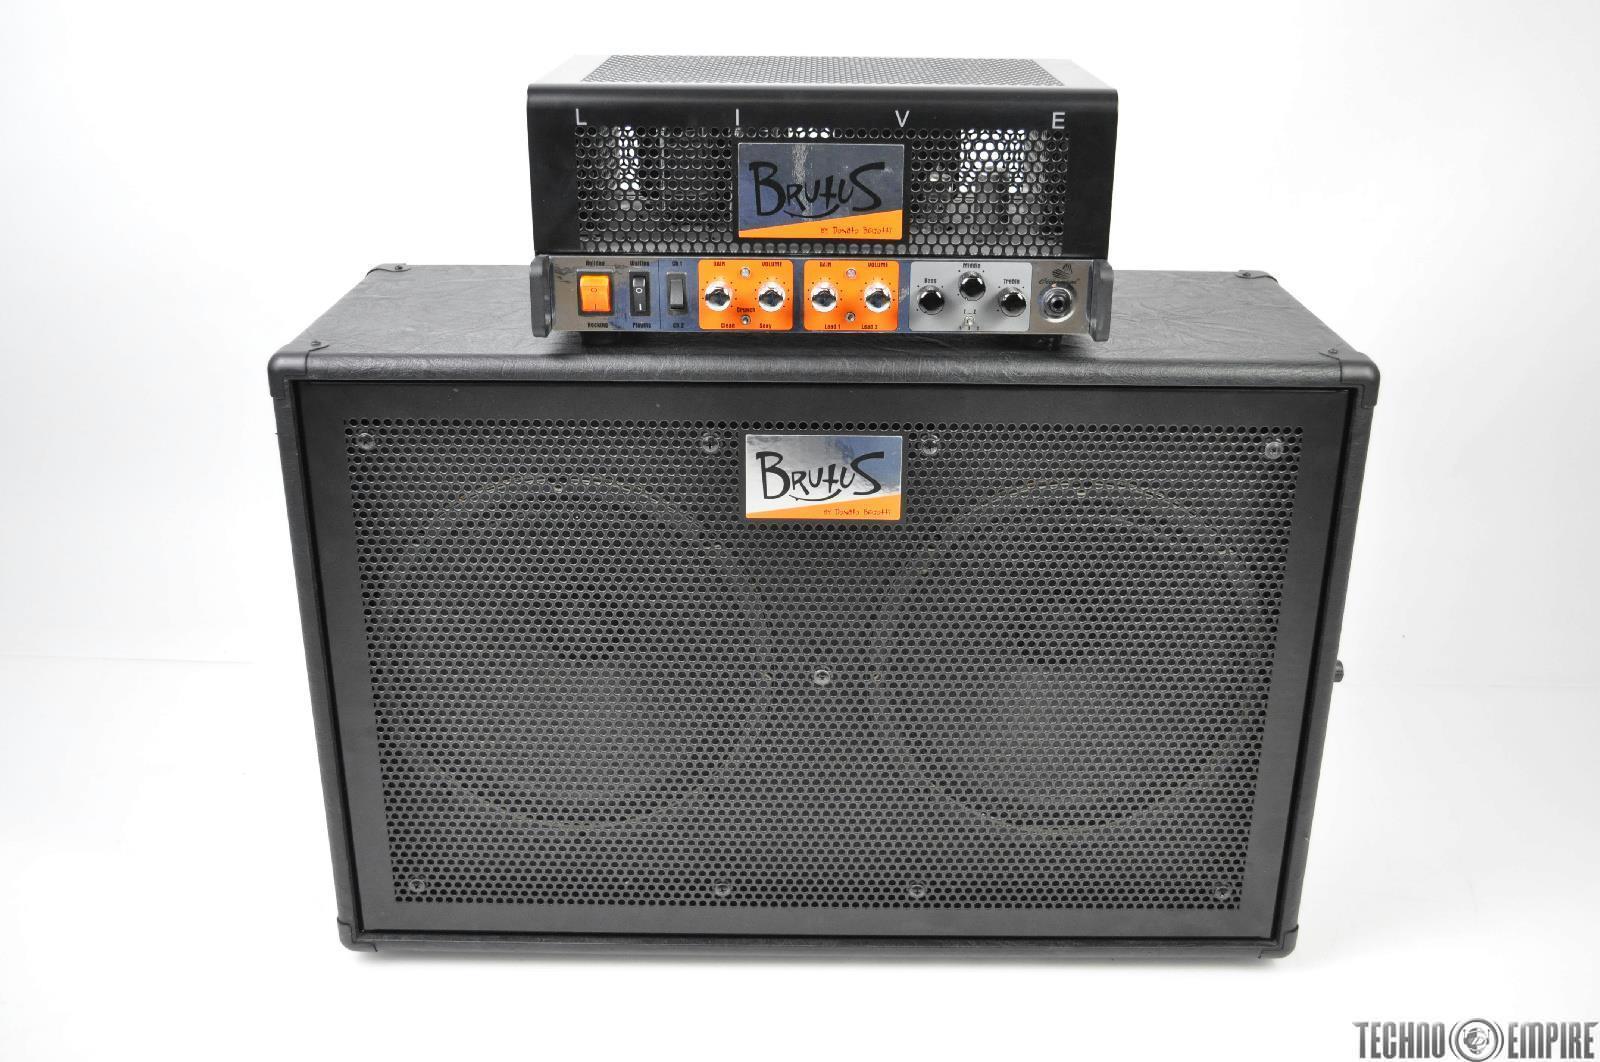 2x12 Speaker Cabinet Cicognani Brutus Live Guitar Tube Amplifier Head 2x12 Speaker